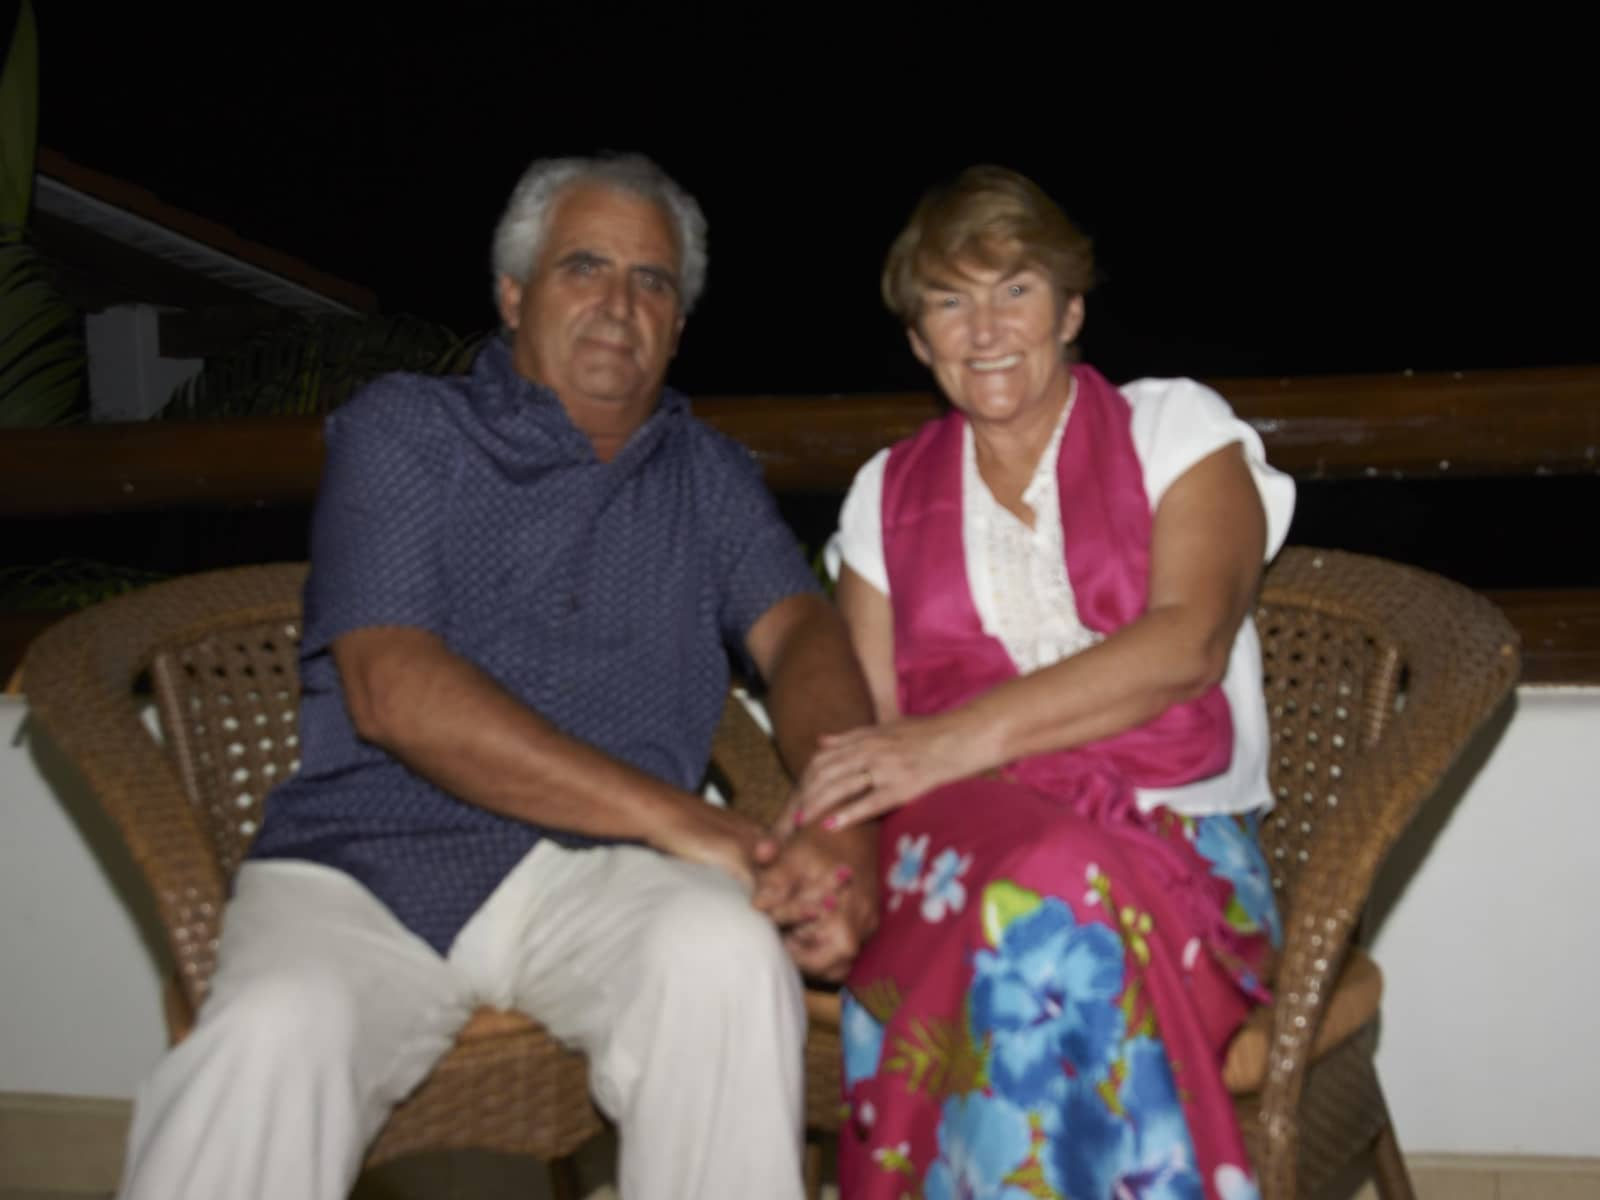 Lynda & Davide from Guernsey